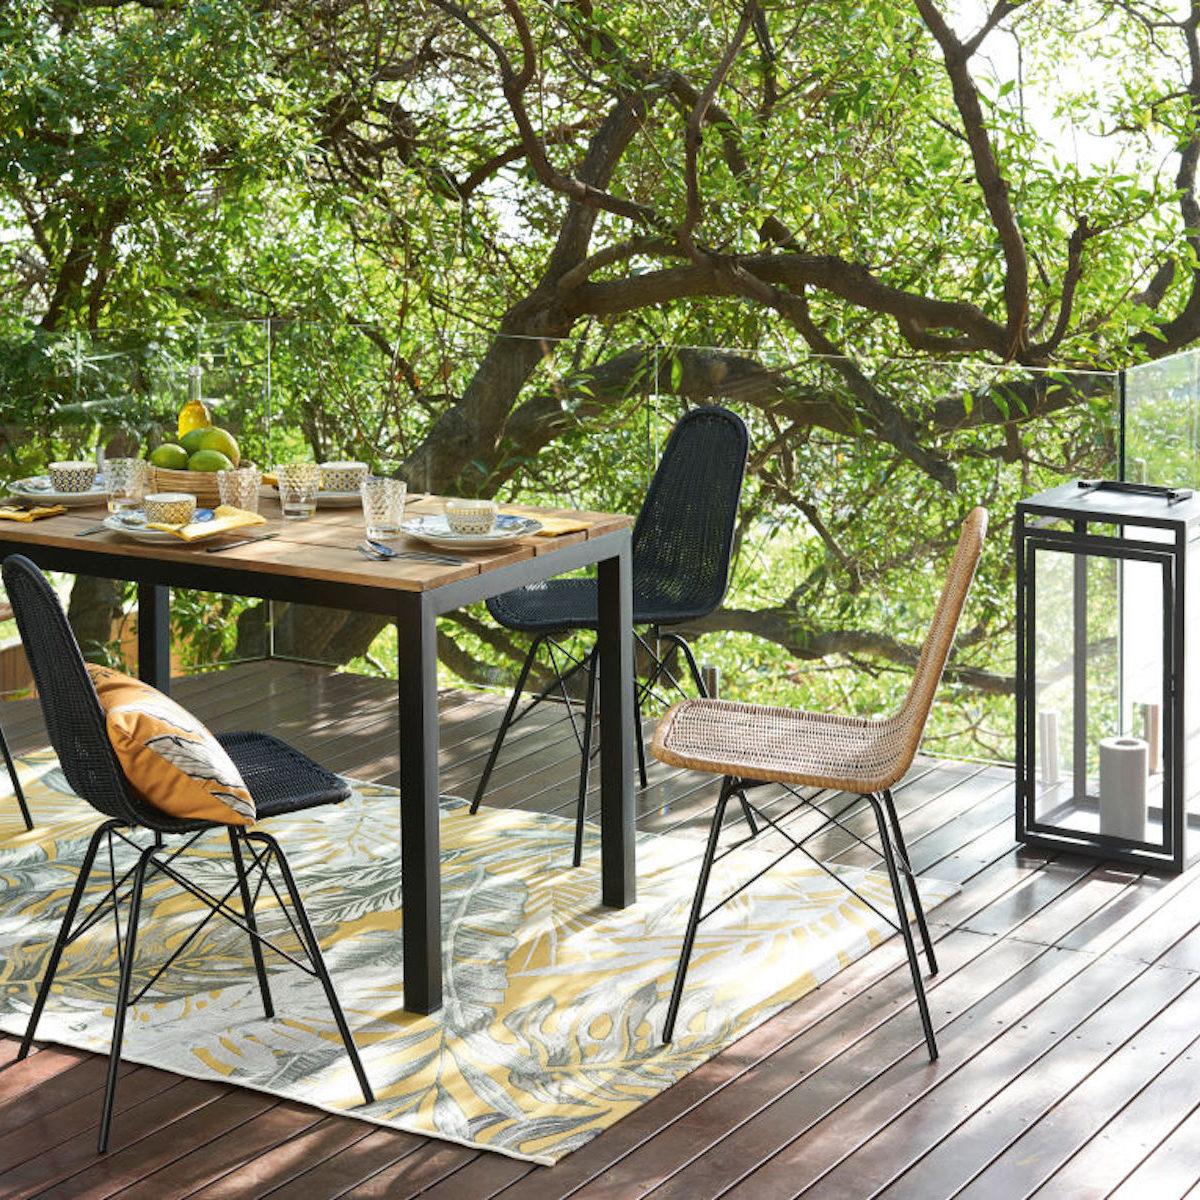 mobilier outdoor maisons du monde ambiance urban jungle - blog déco - clem around the corner